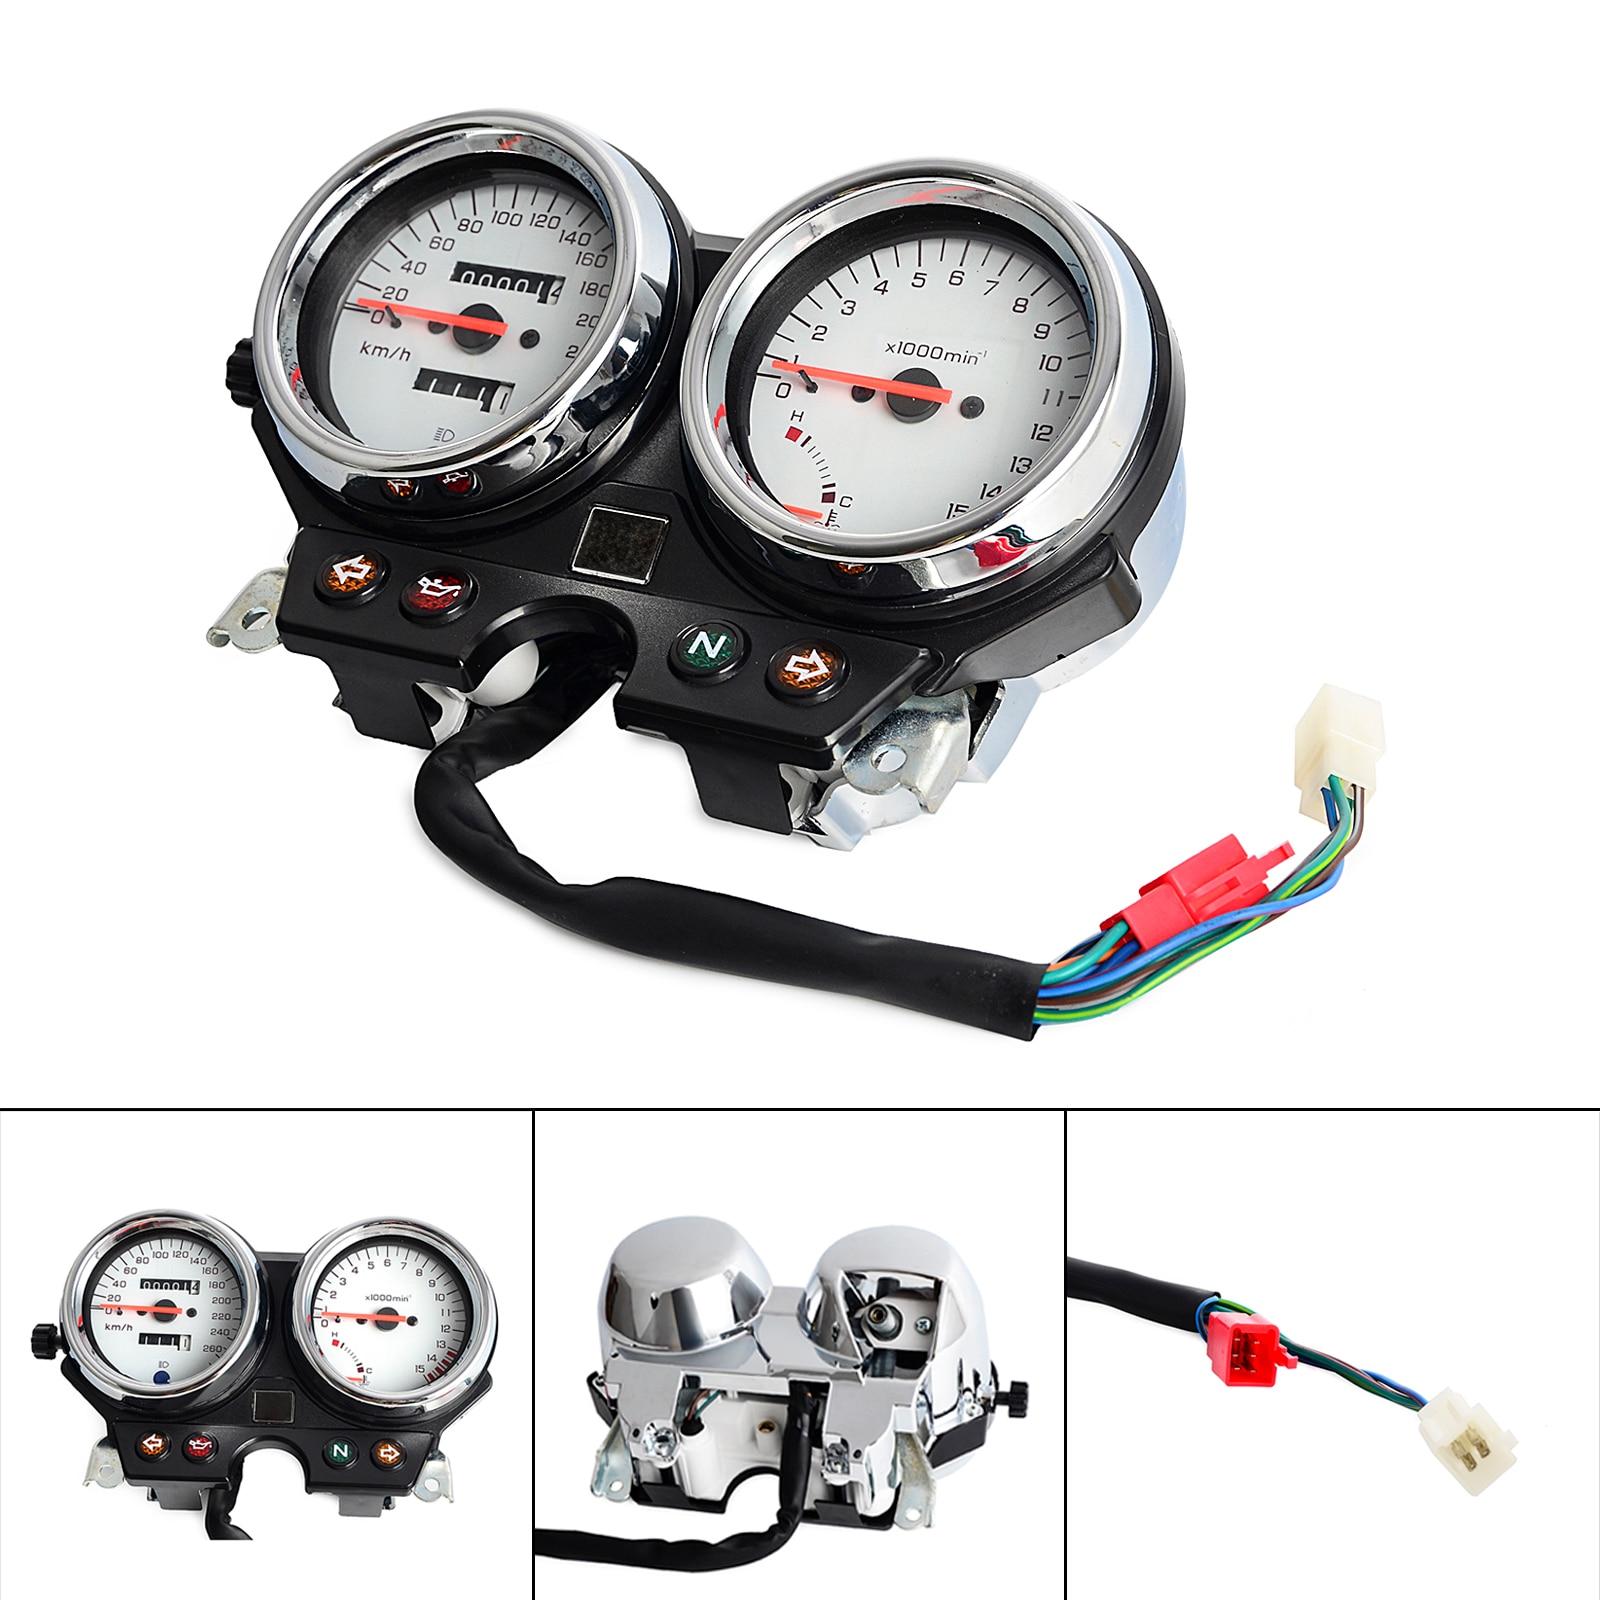 Motorky Gauge Cluster Speedometer Dashboard Tachometr pro Honda CB600 Hornet 600 1996 1997 1998 1999 2000 2001 2002